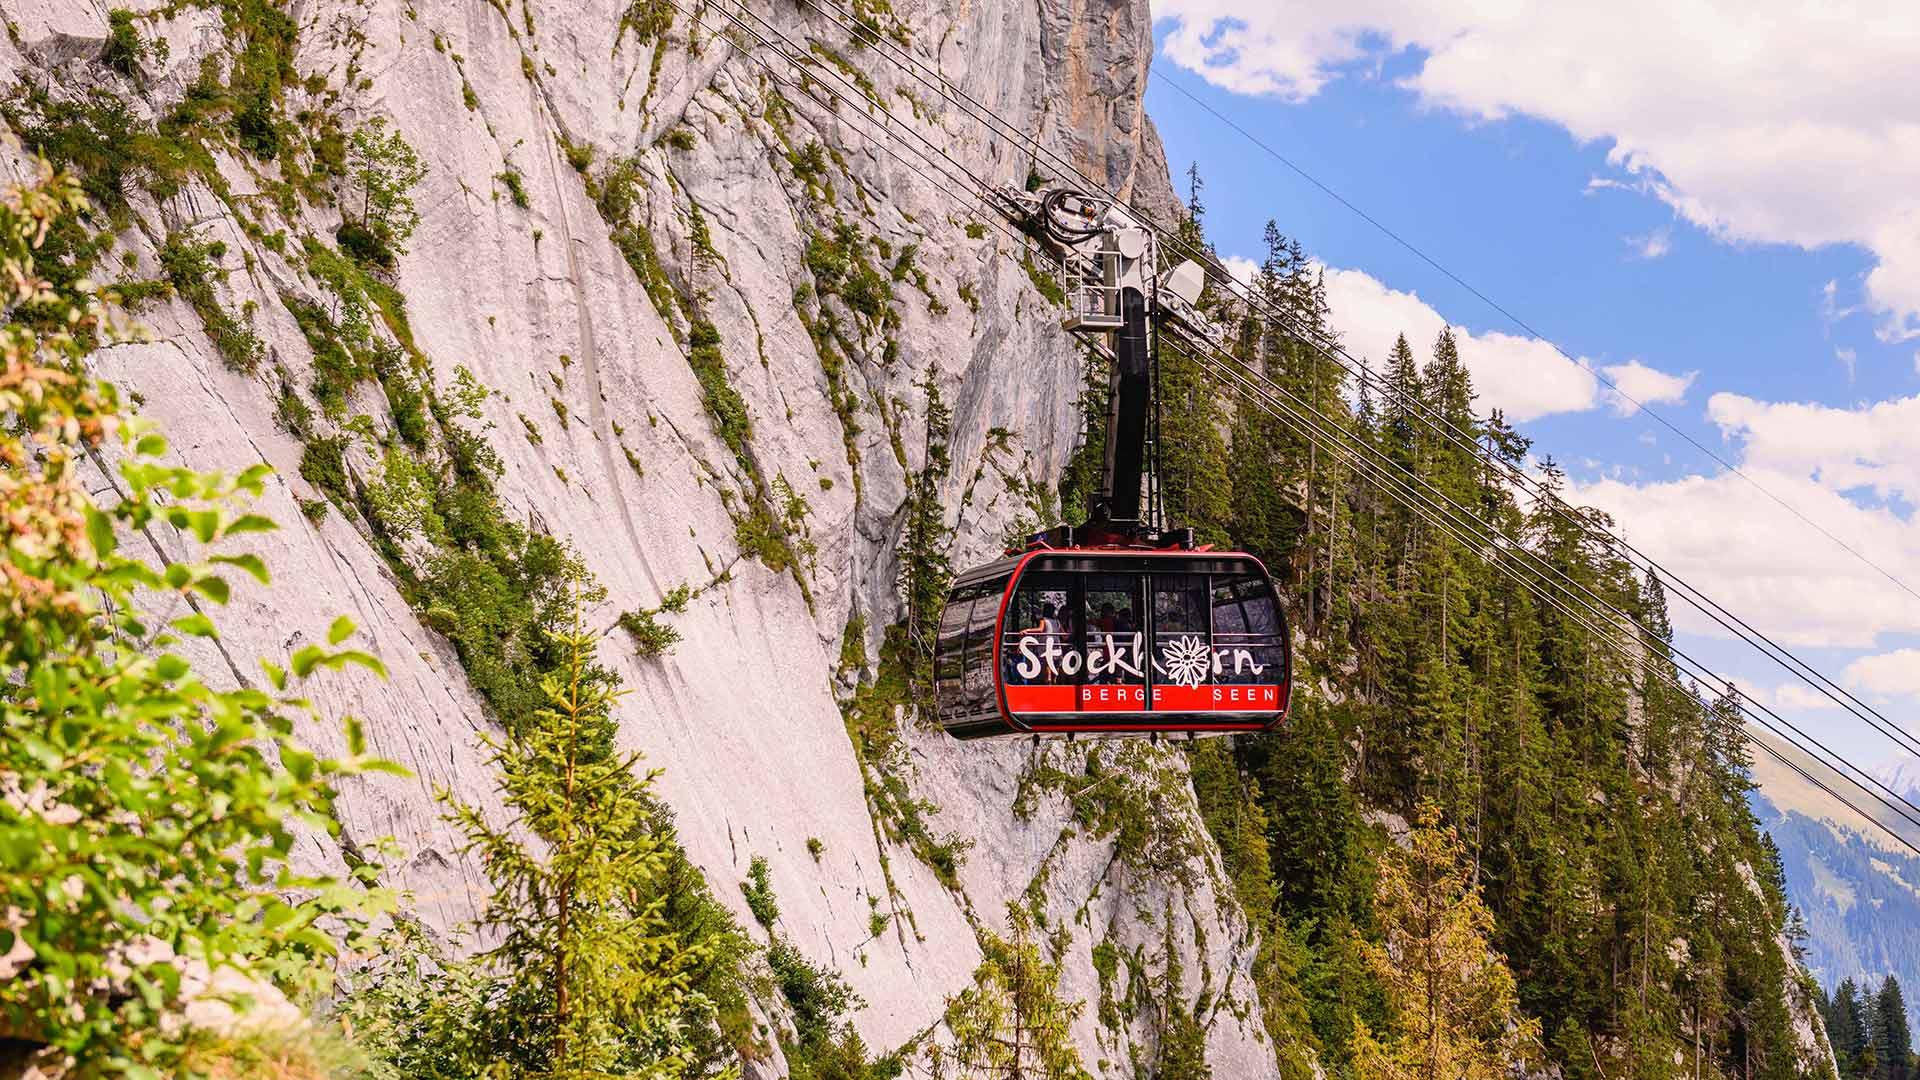 stockhorn-gondel-sommer-bergausflug